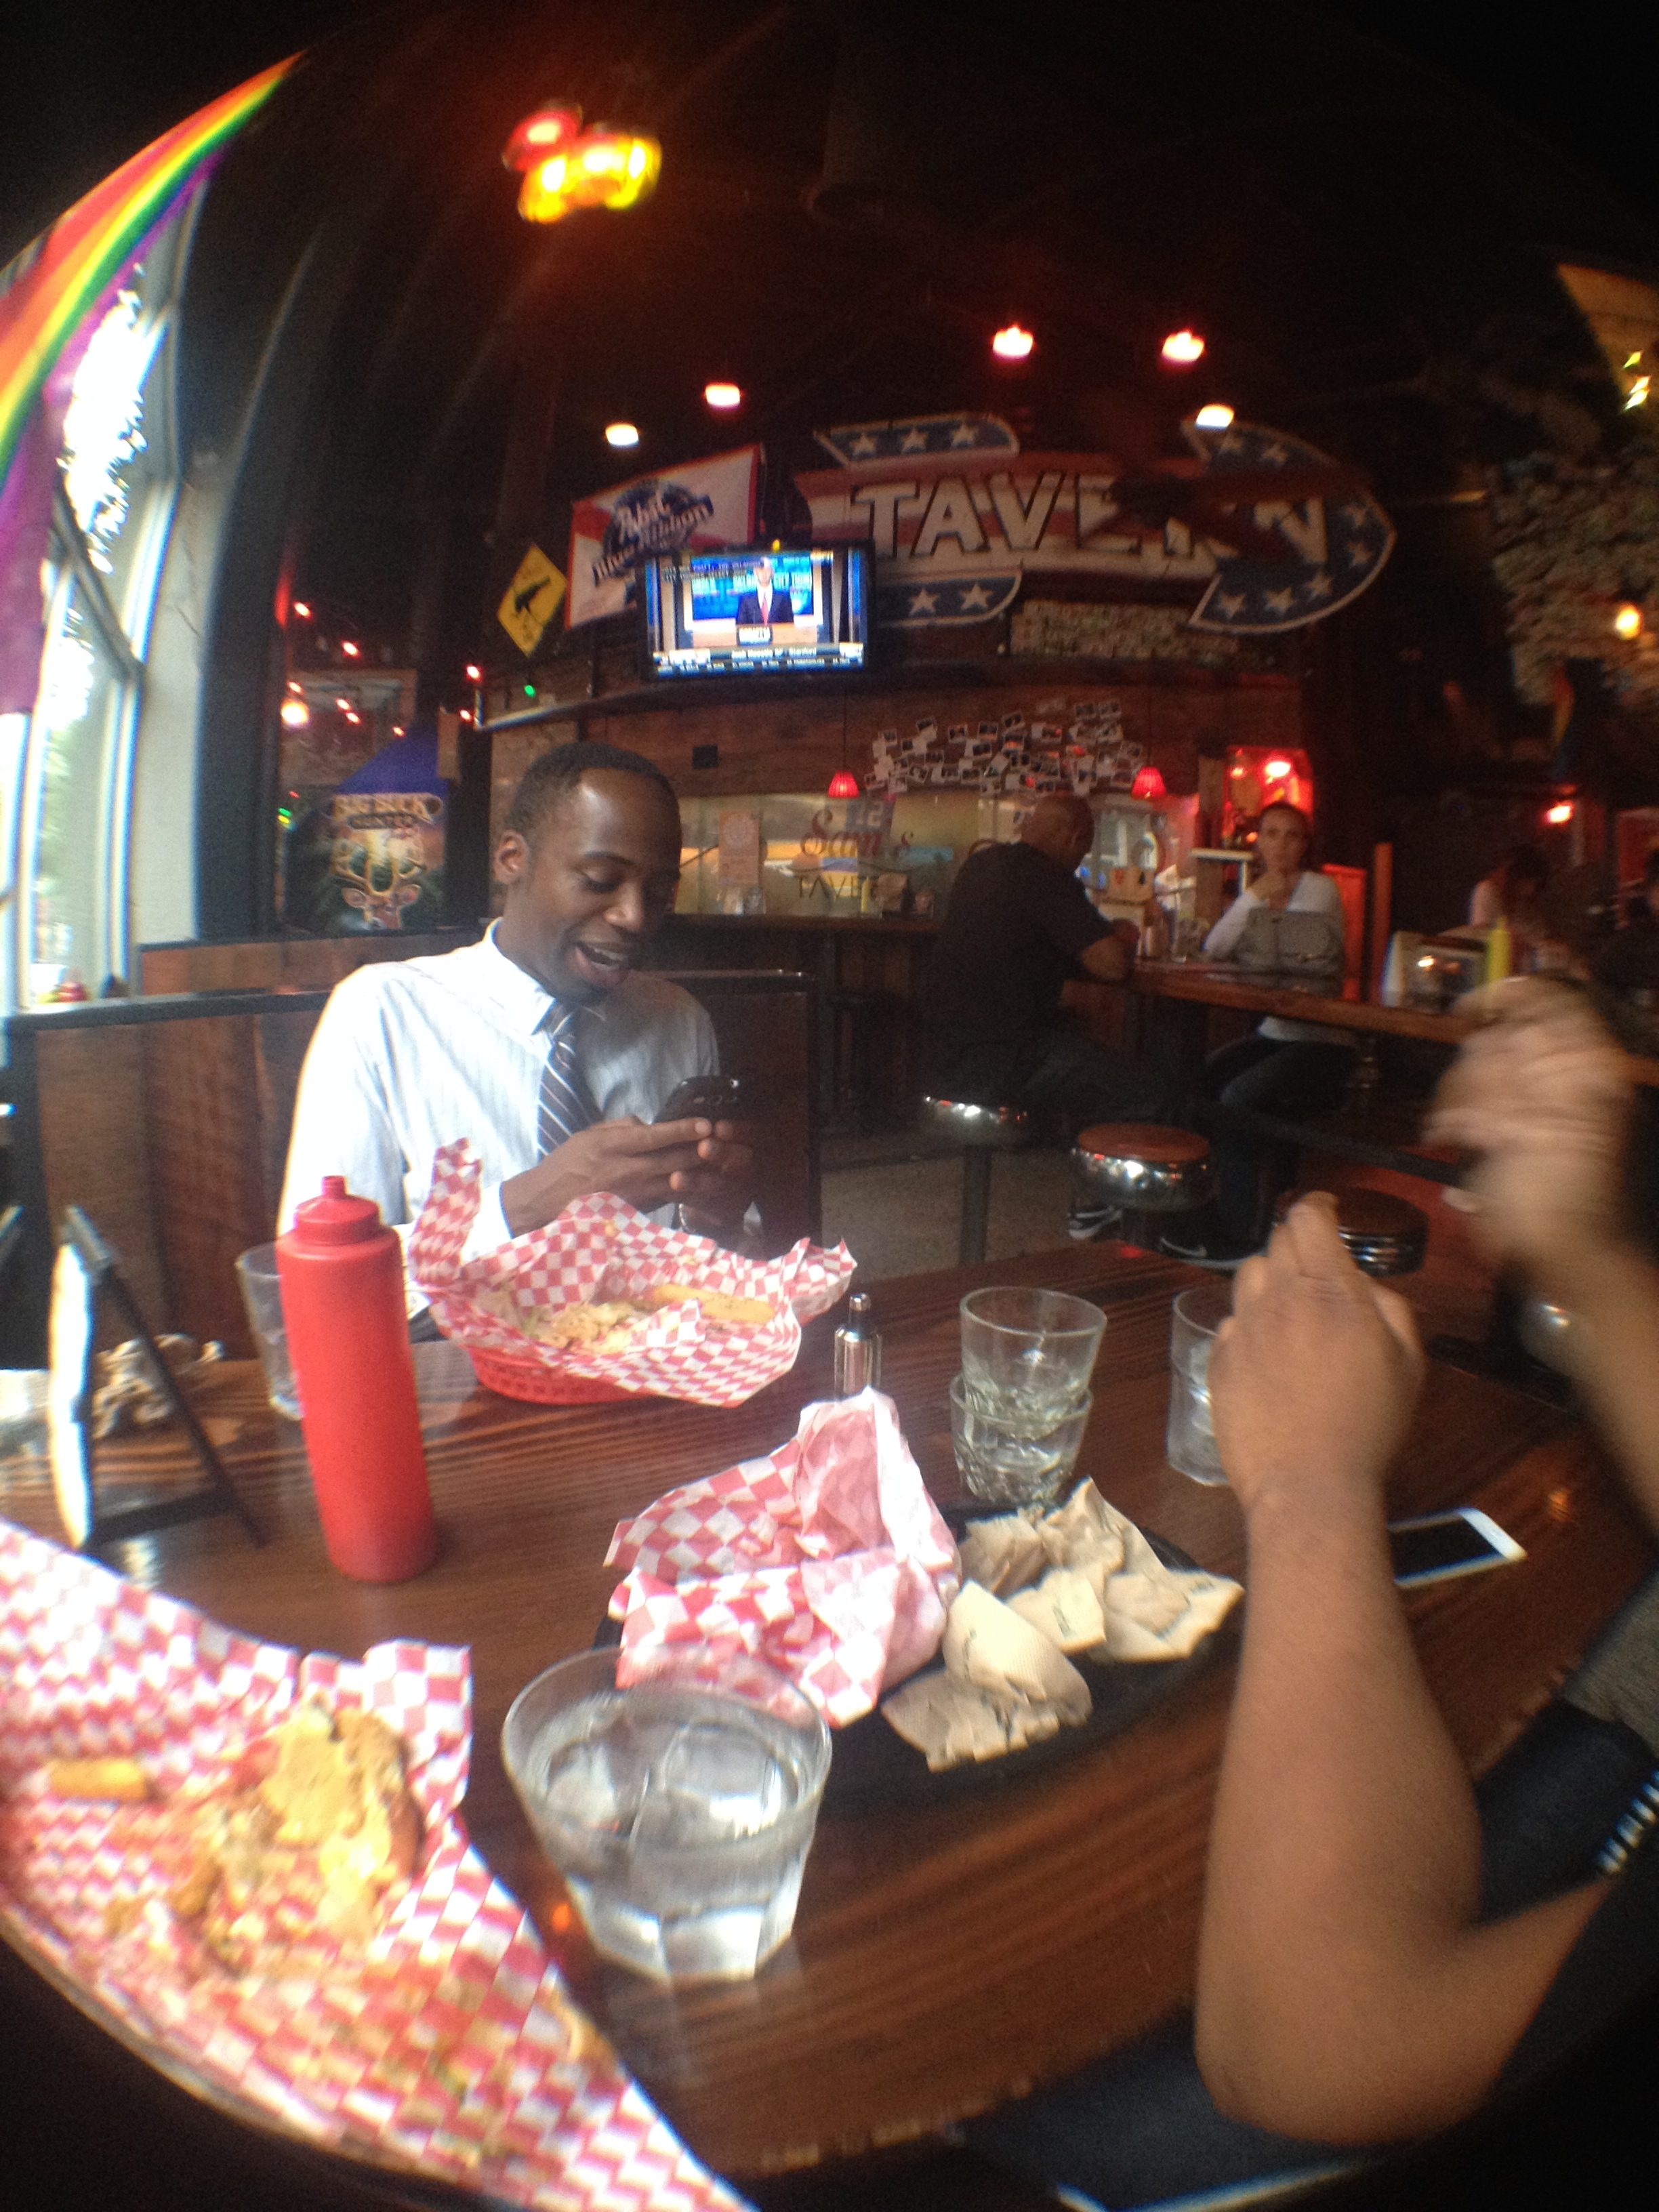 Burgers with Malik at Sam's tavern.